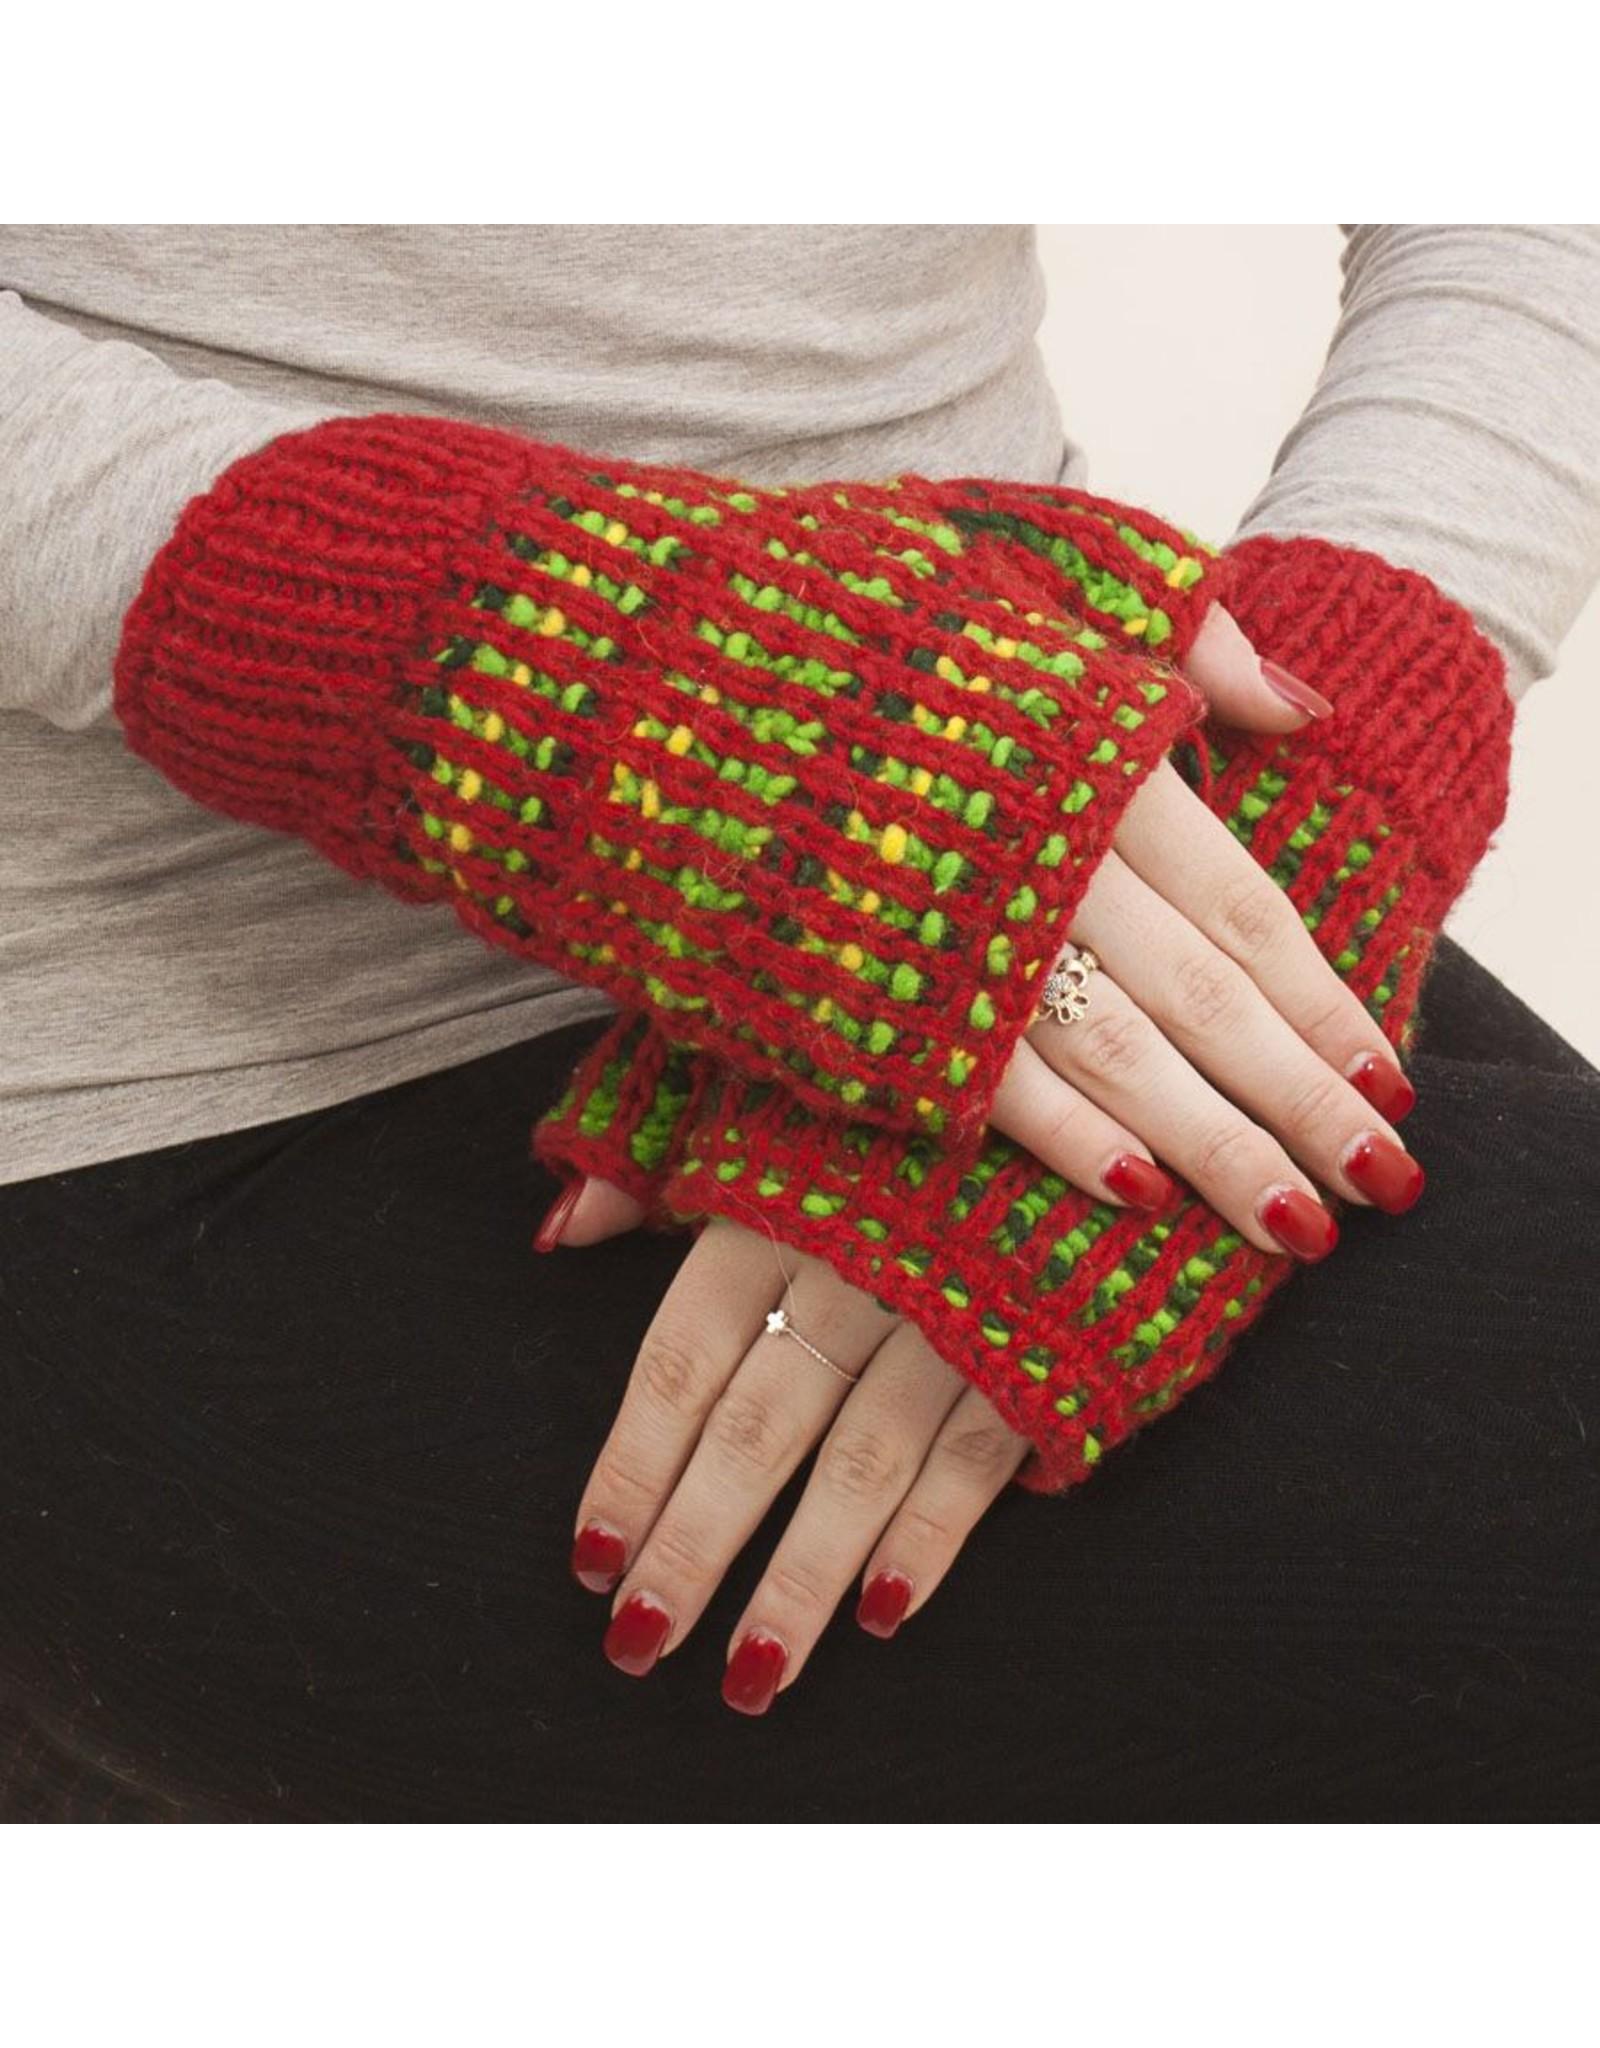 The Sweater Venture Polka Dot Wristlet